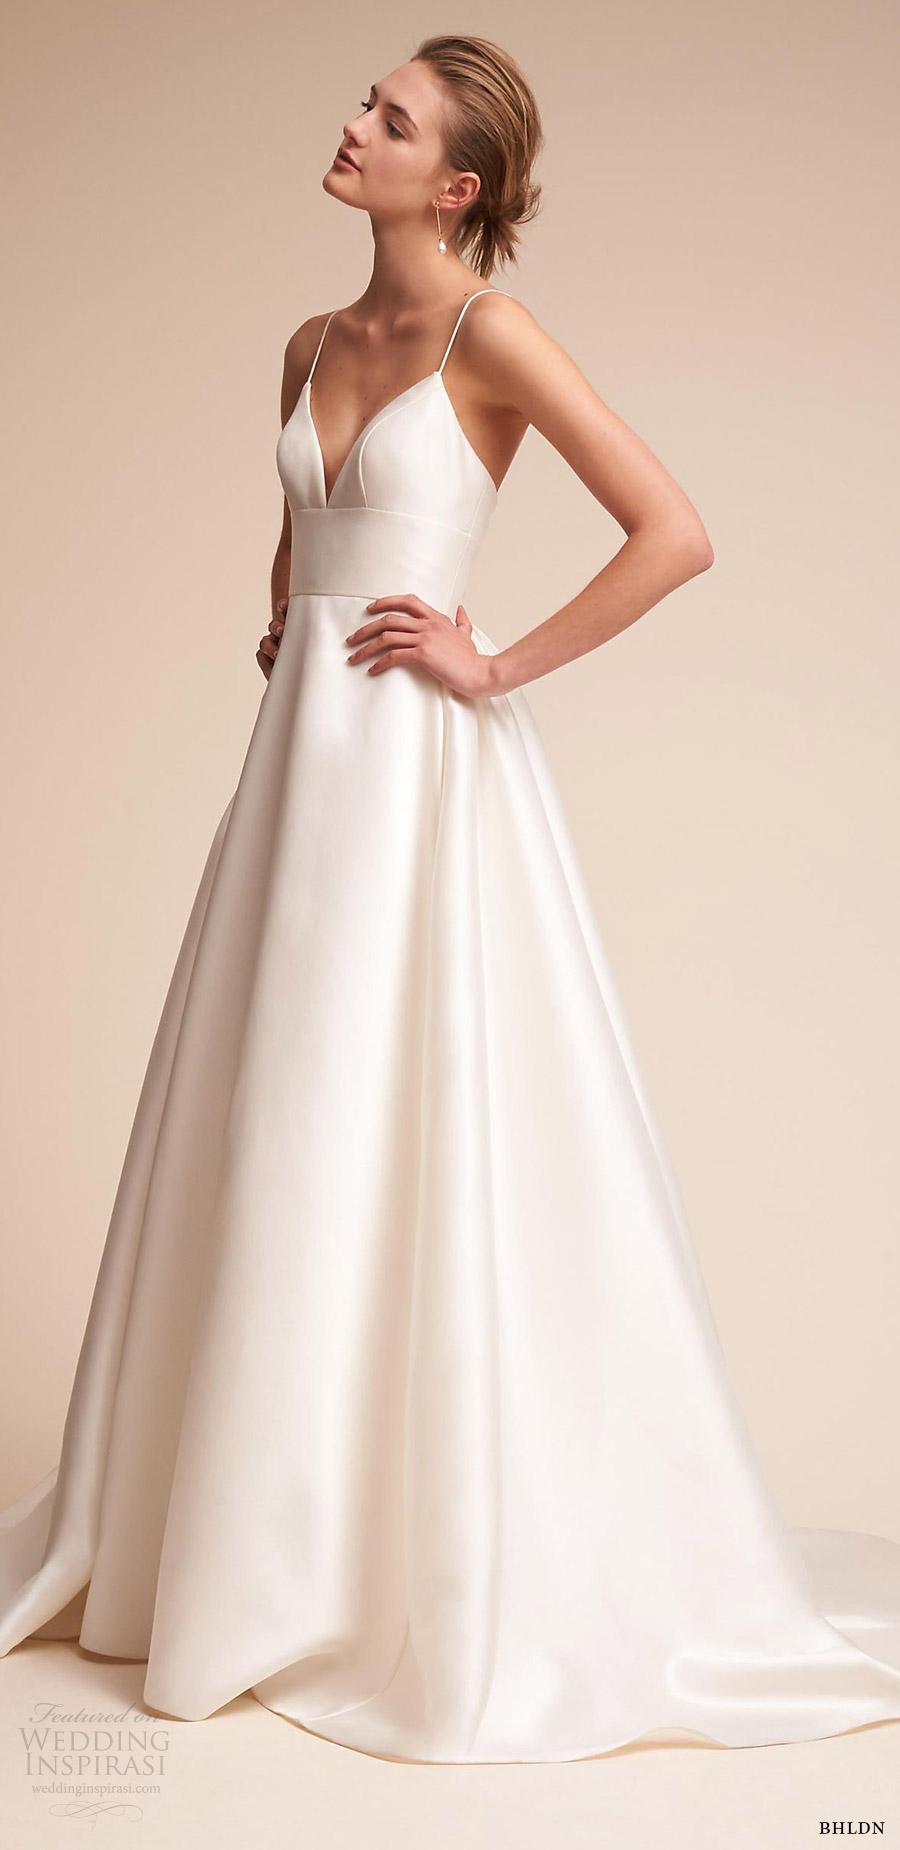 bhldn 2018 bridal trends sleeveless thin straps sweetheart ball gown wedding dress (opal) sv chapel train romantic elegant